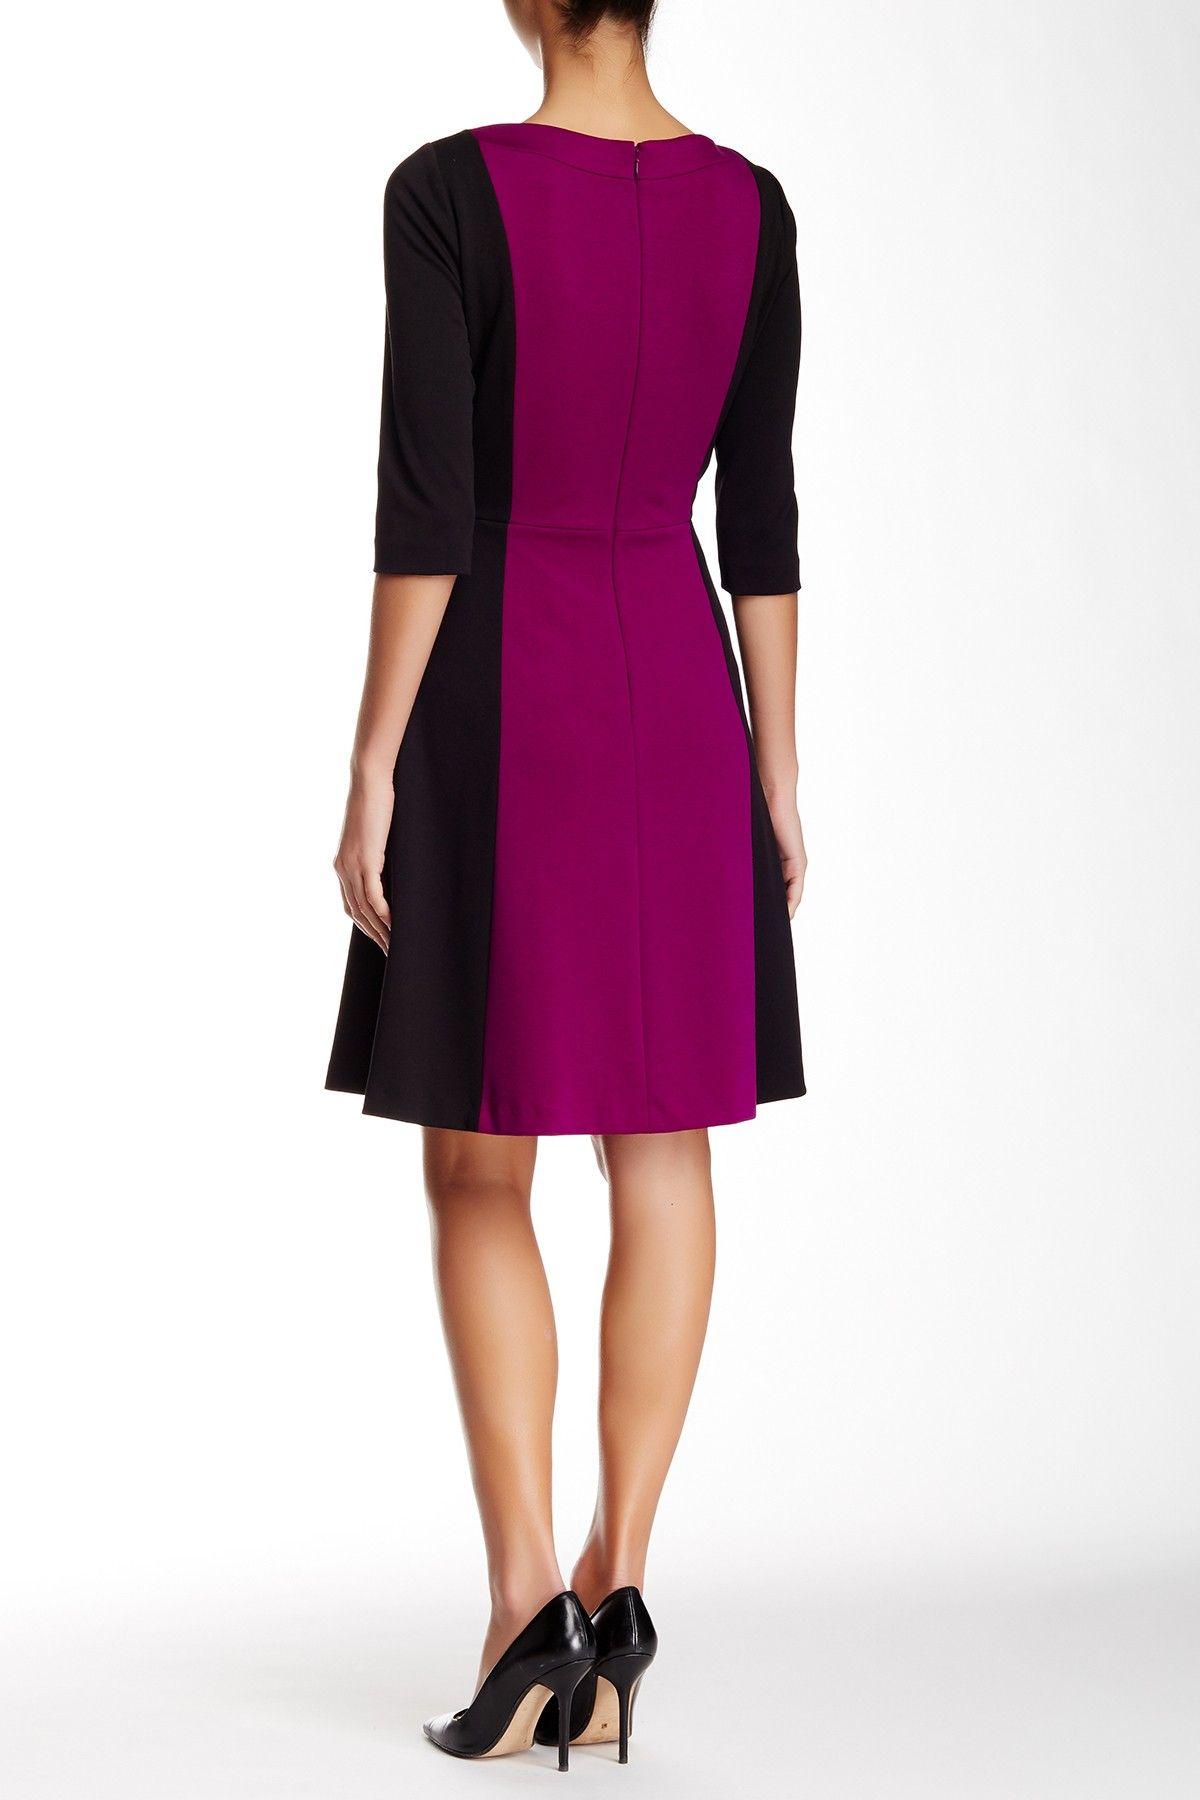 Elbow Length Sleeve Colorblock Ponte Fit & Flare Dress by Tahari on @nordstrom_rack Sponsored by Nordstrom Rack.